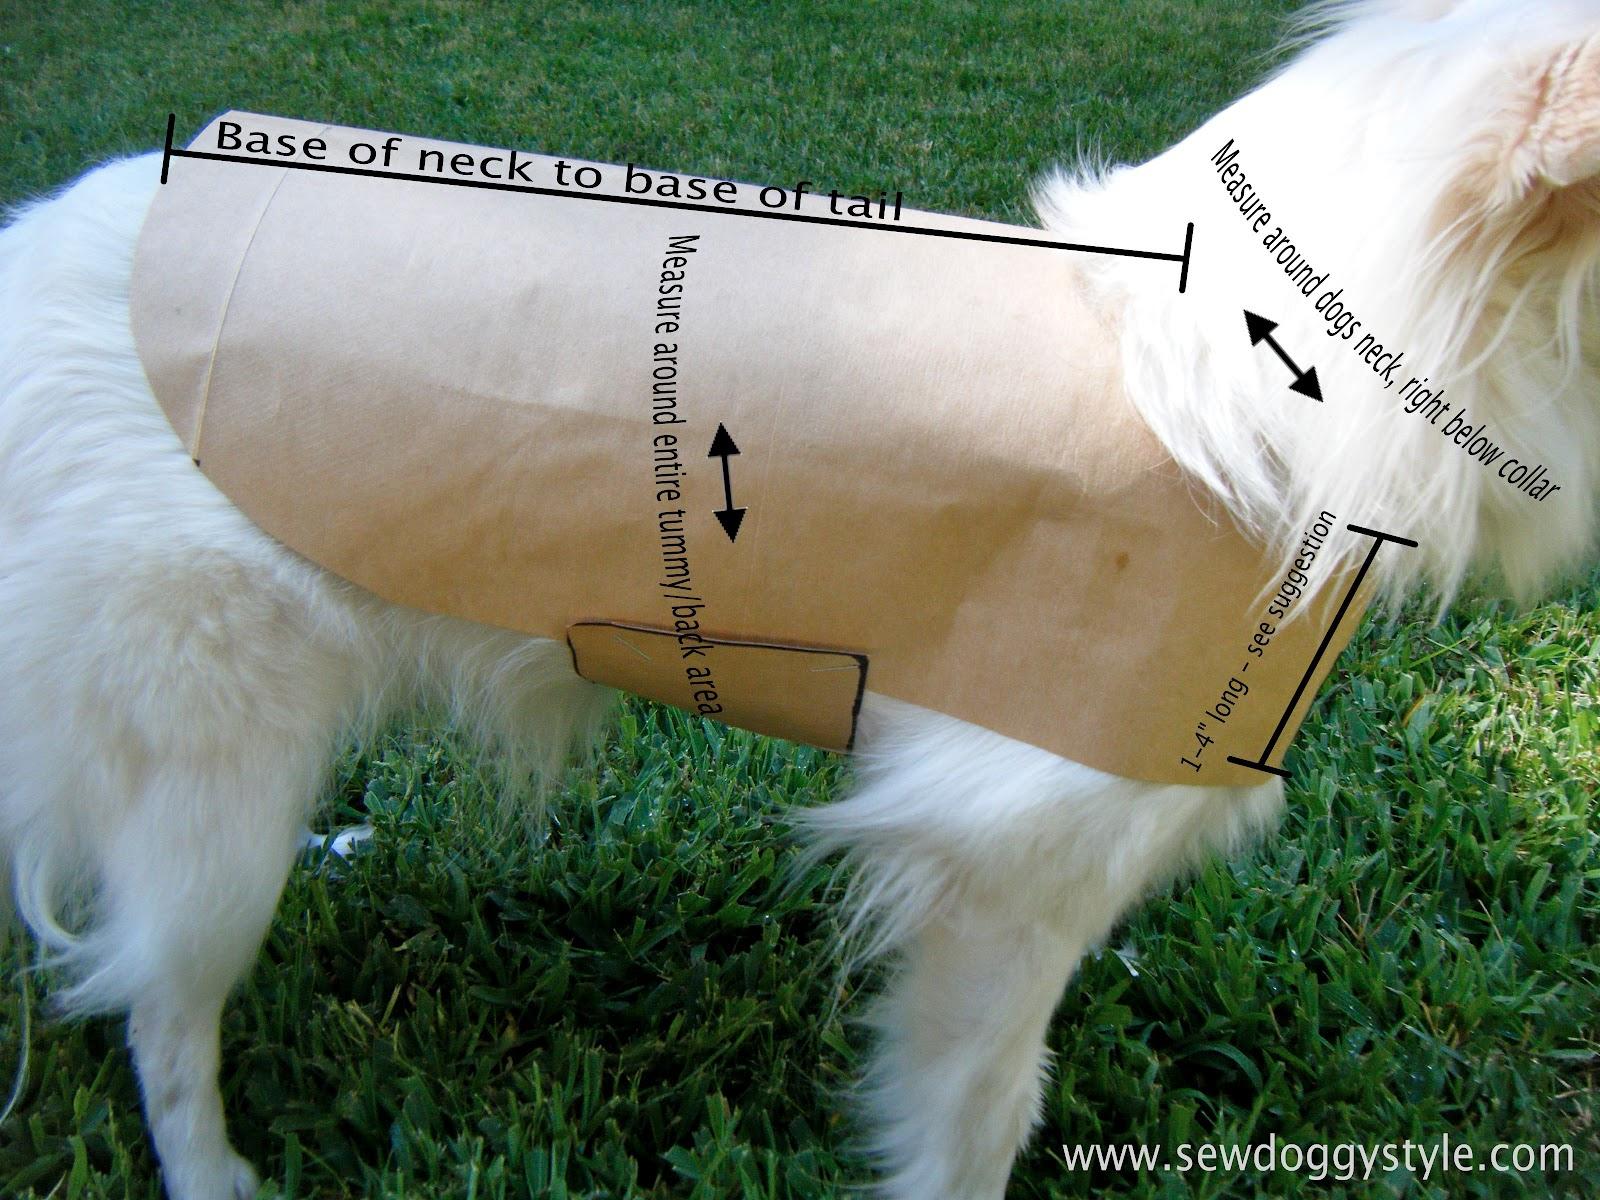 Sew Doggystyle: Diy Pet Coat Pattern - Free Printable Dog Coat Sewing Patterns